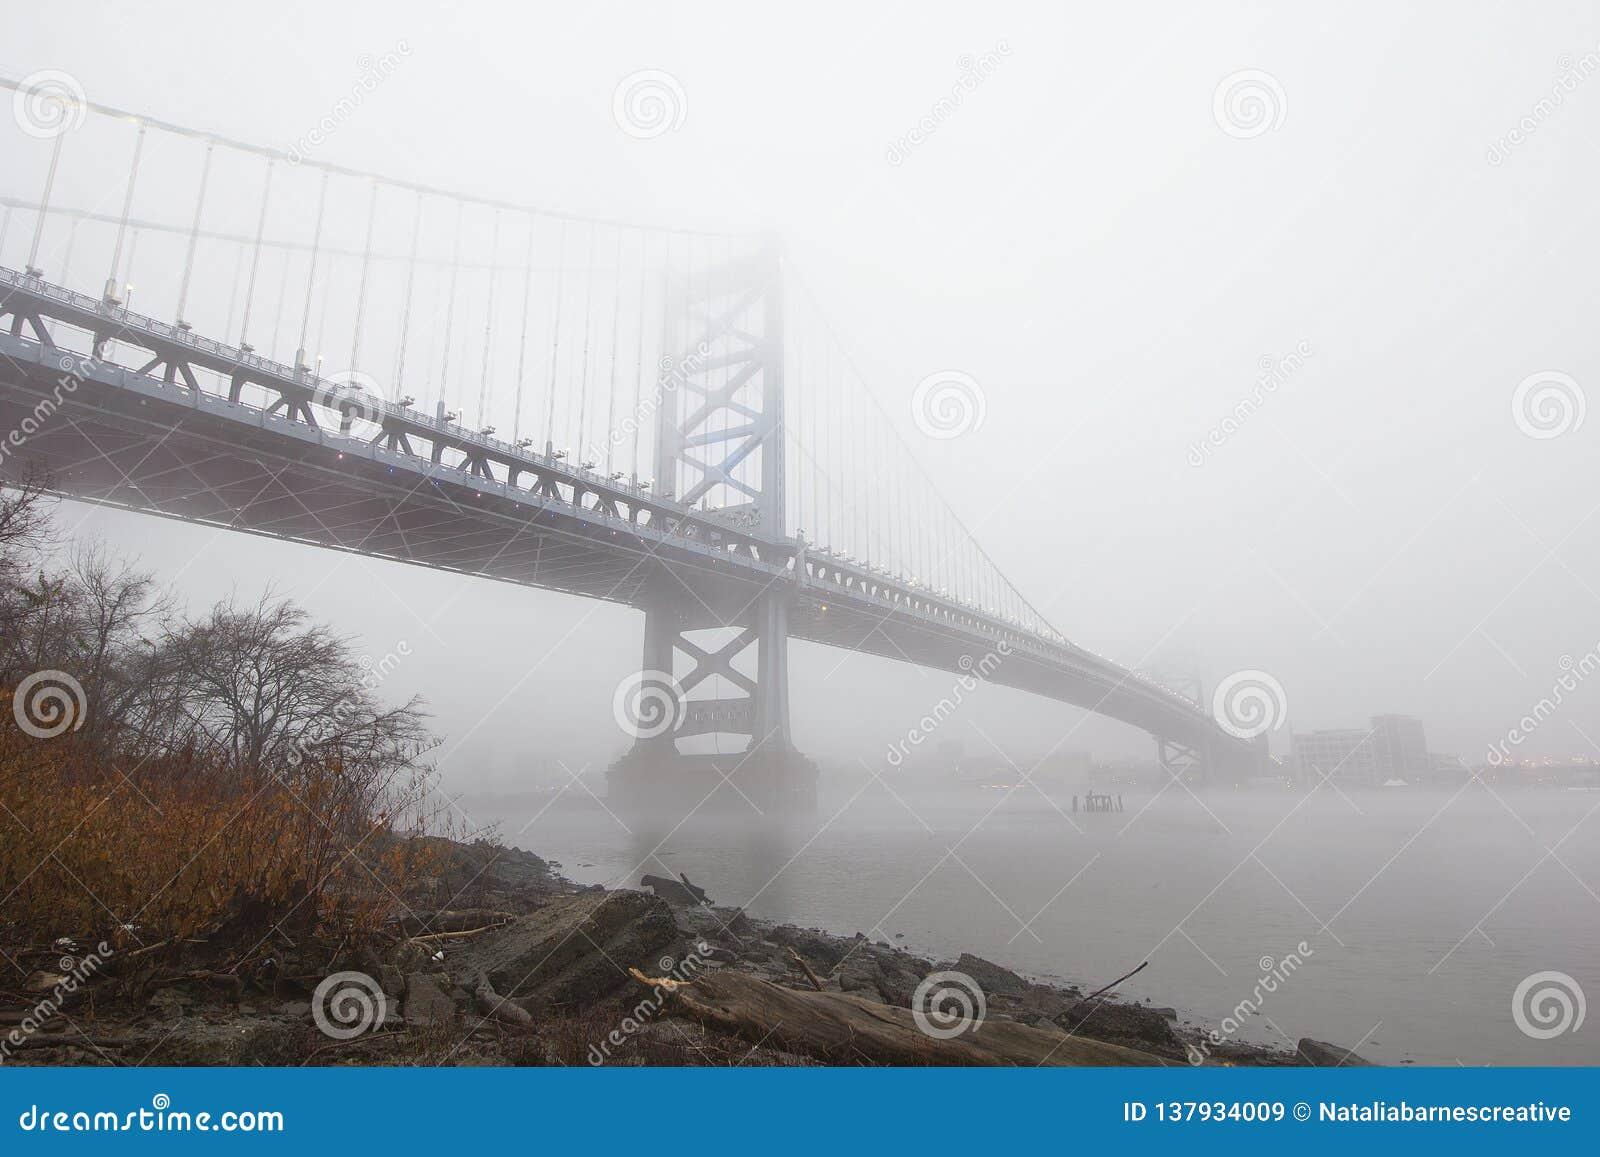 A Bridge Shrouded In Fog Stock Image Image Of Philadelphia 137934009